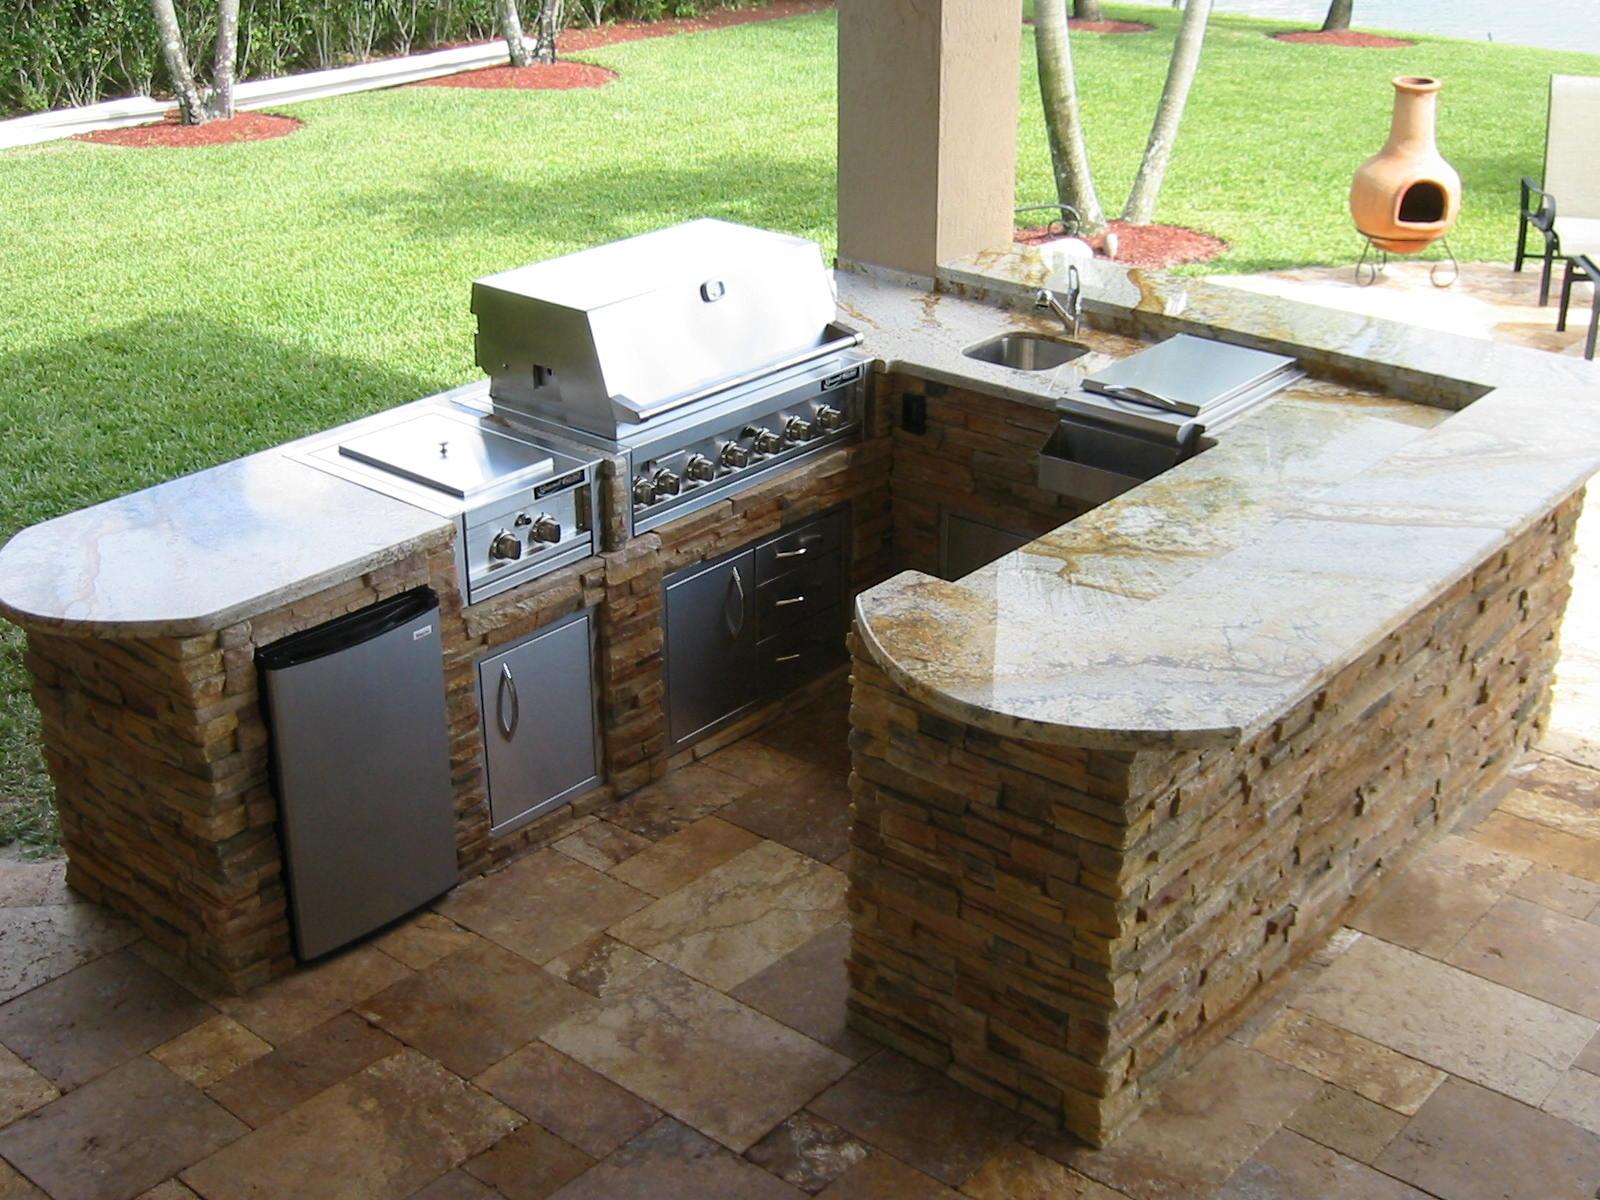 outdoor kitchen depot outdoor kitchen building and design. Black Bedroom Furniture Sets. Home Design Ideas